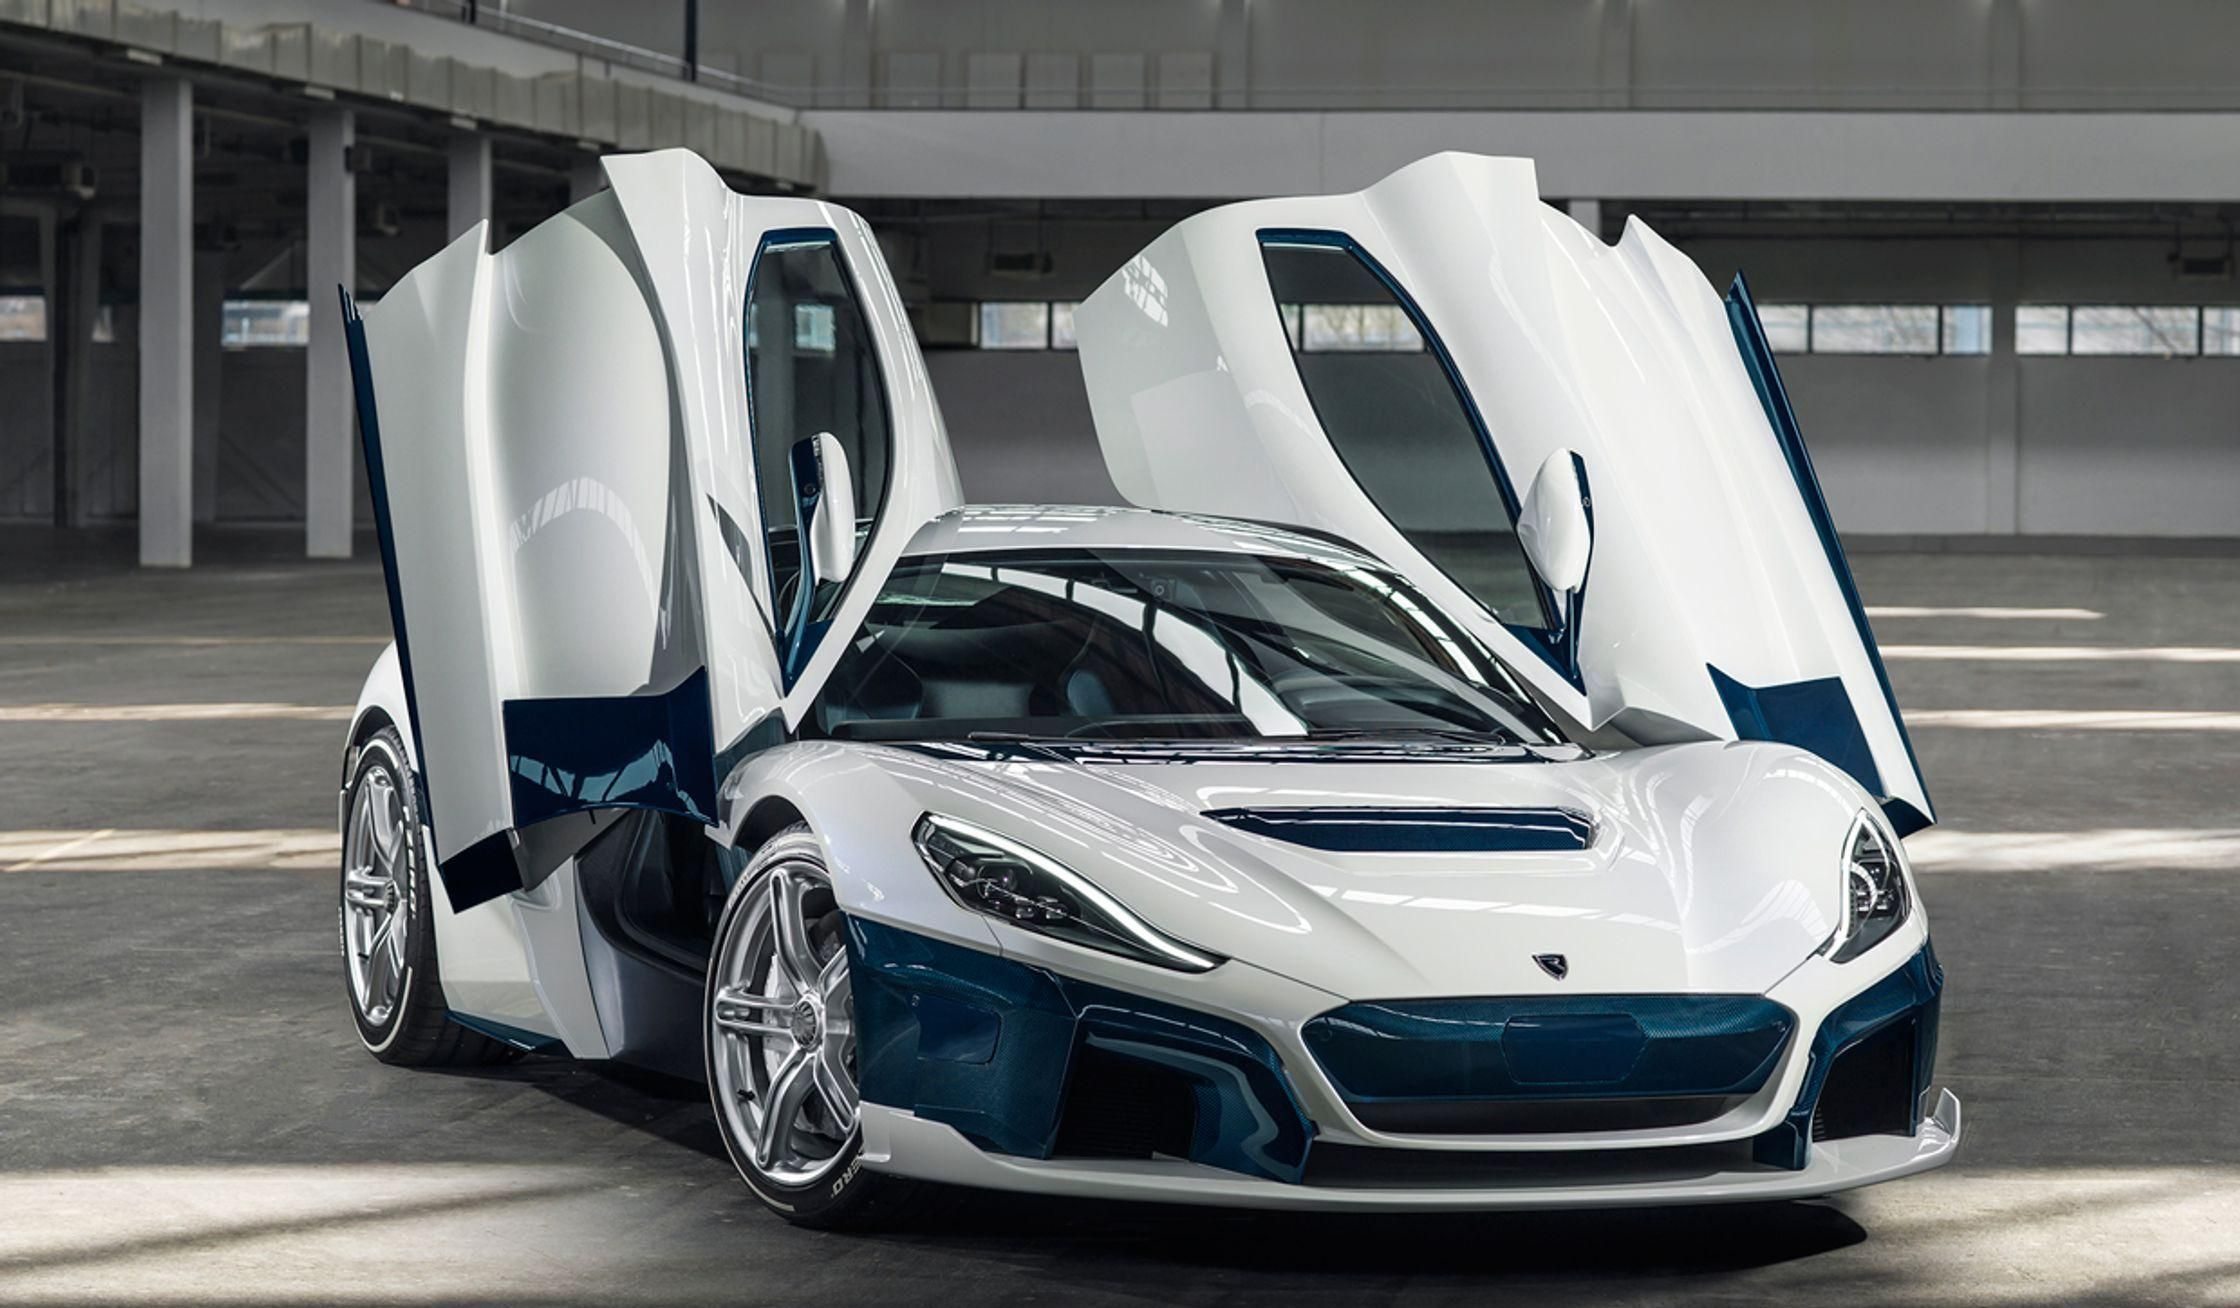 2021 Top 10 Tech Cars